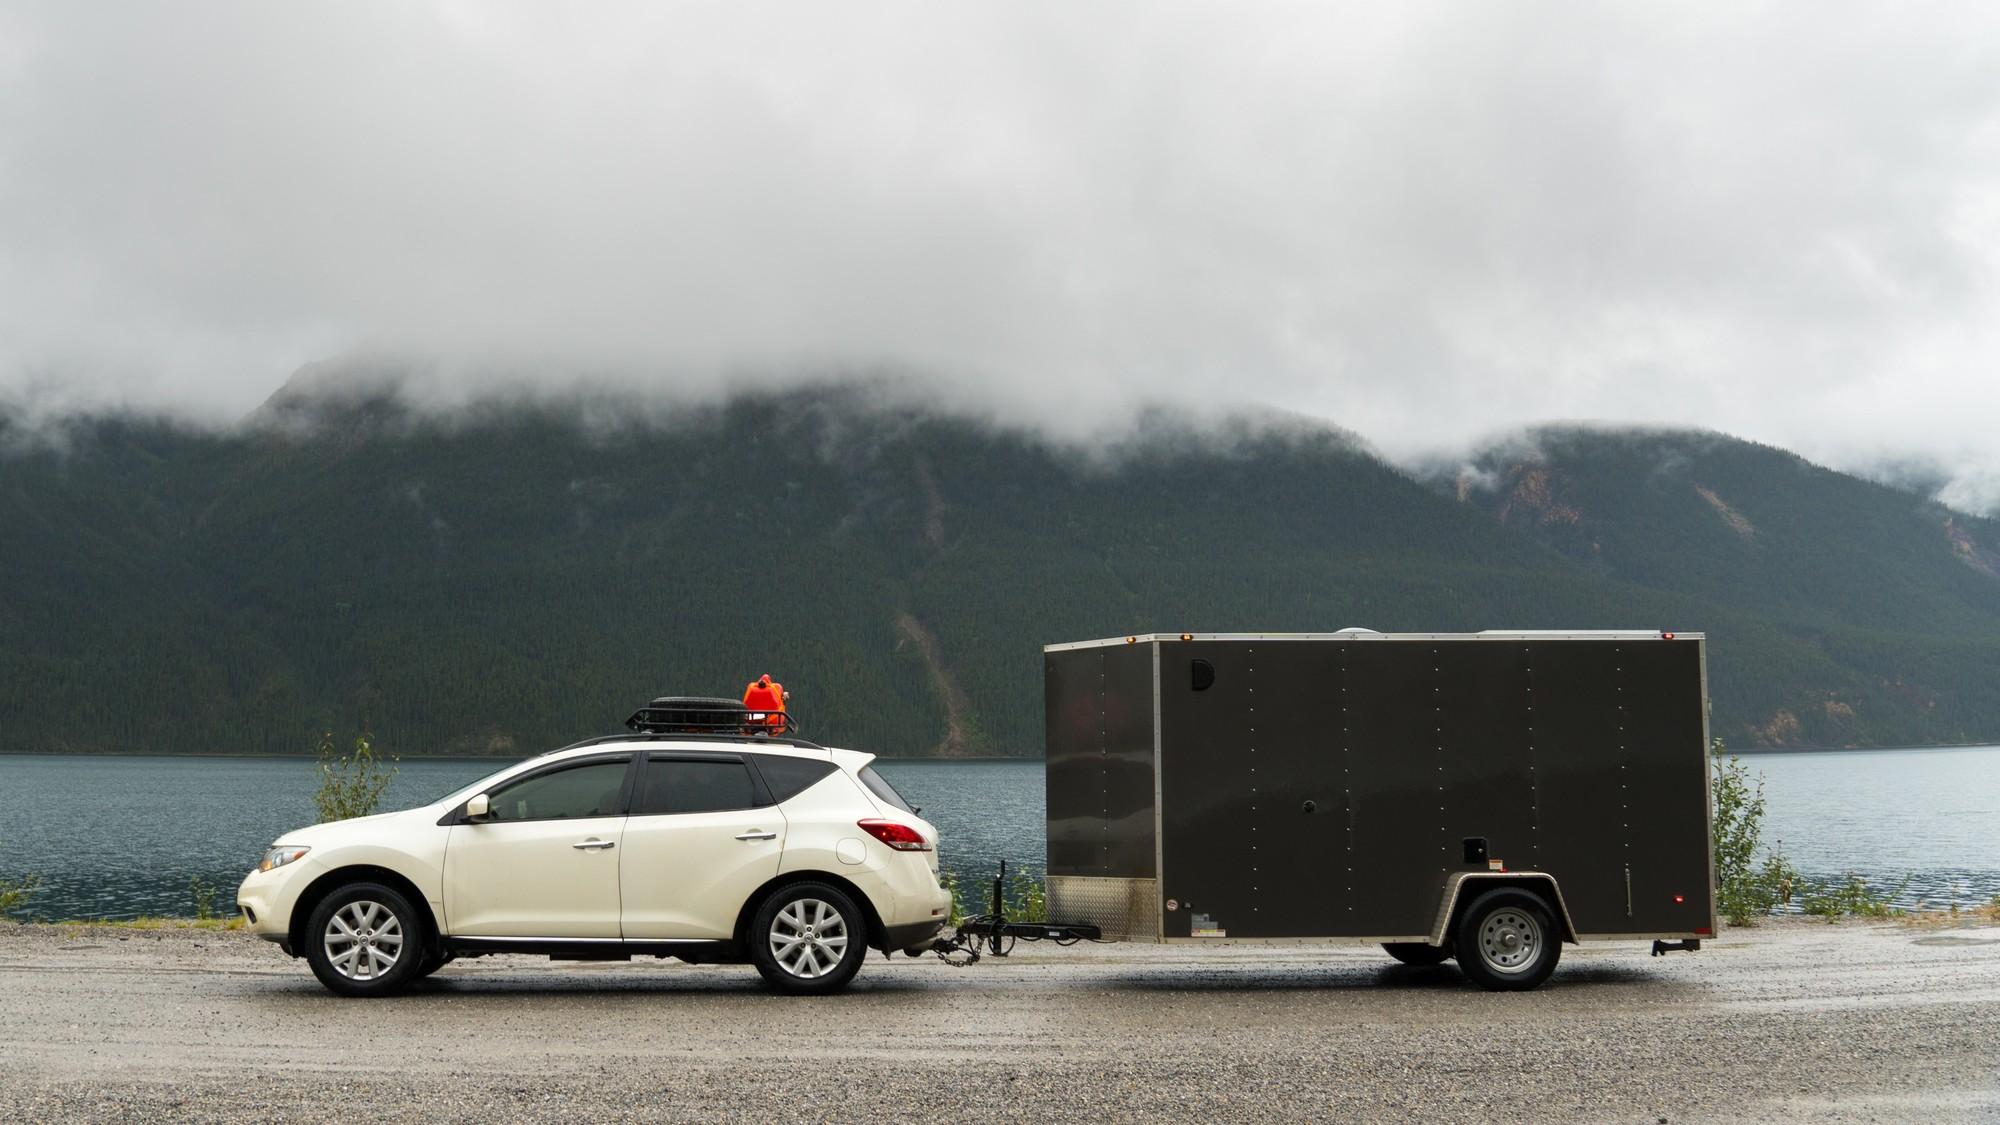 Free camping spots along Alaska highway | 2018